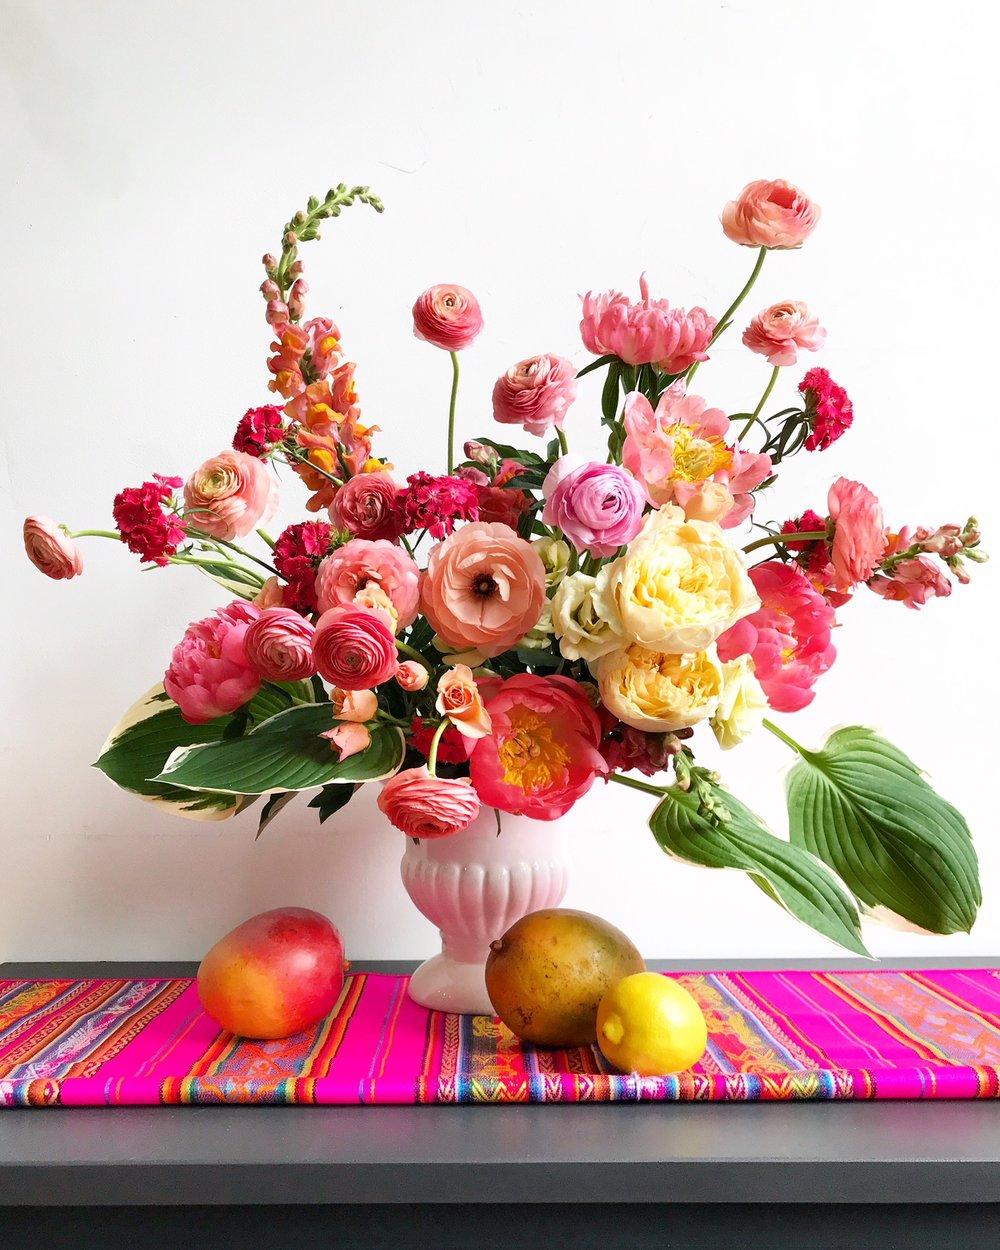 TEXTURE Florals   email:    nicole@textureflorals.com    website:    www.textureflorals.com    instagram:    @textureflorals